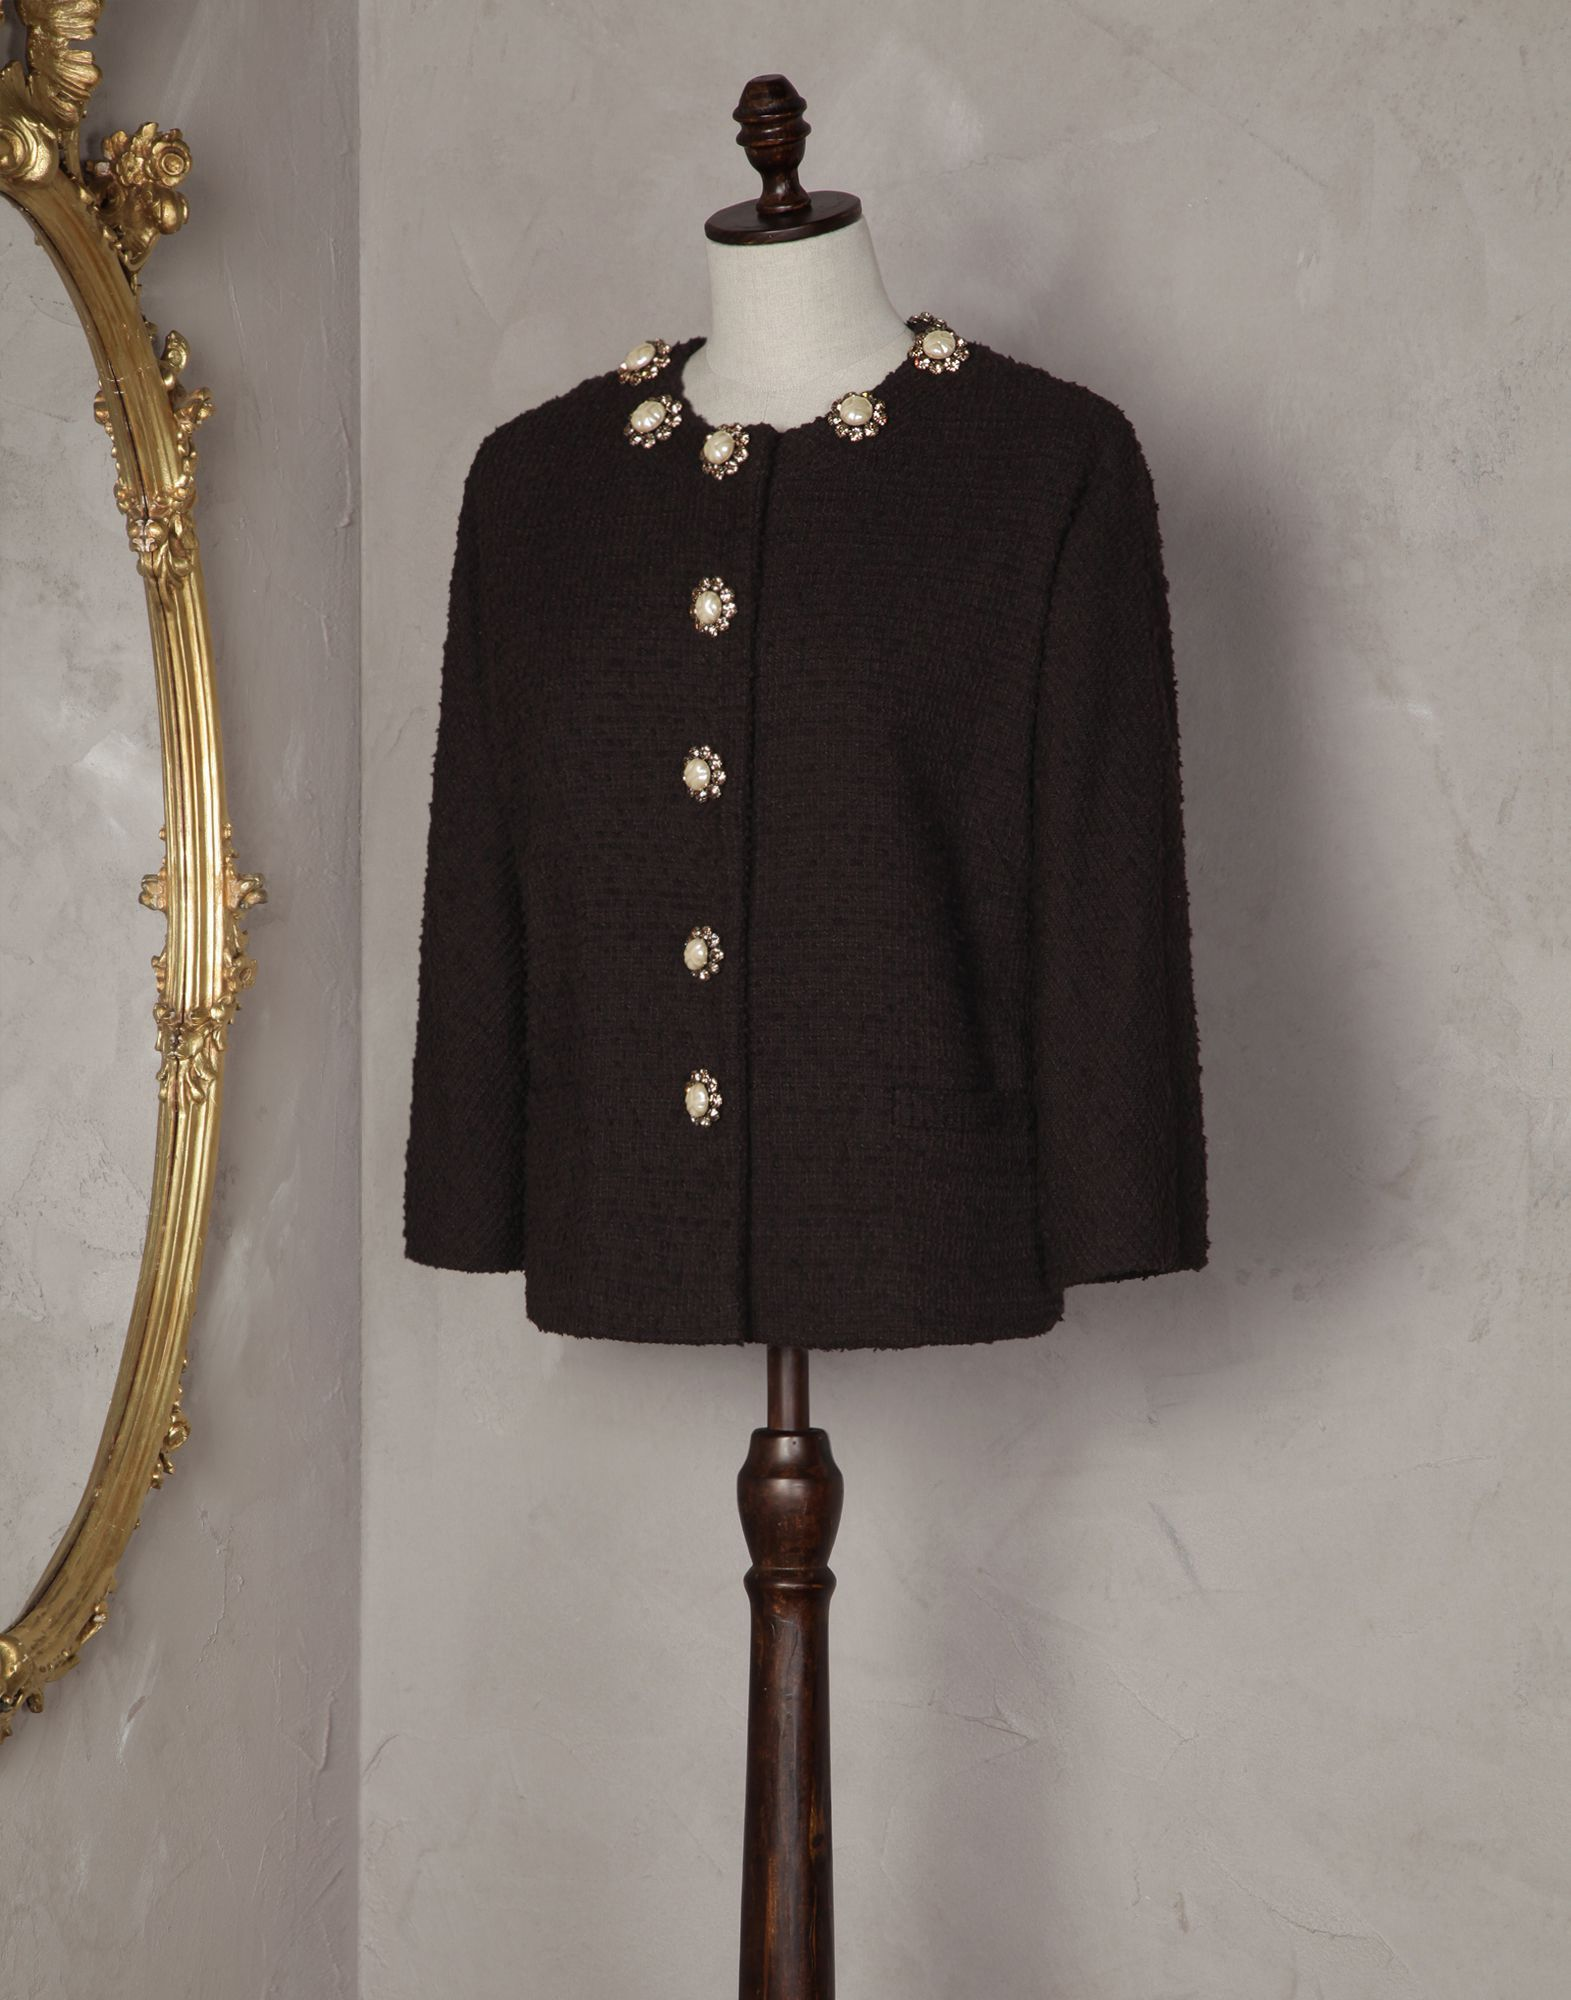 Dolce&Gabbana|F272PT-FUM1E|Kostüme|Jacken